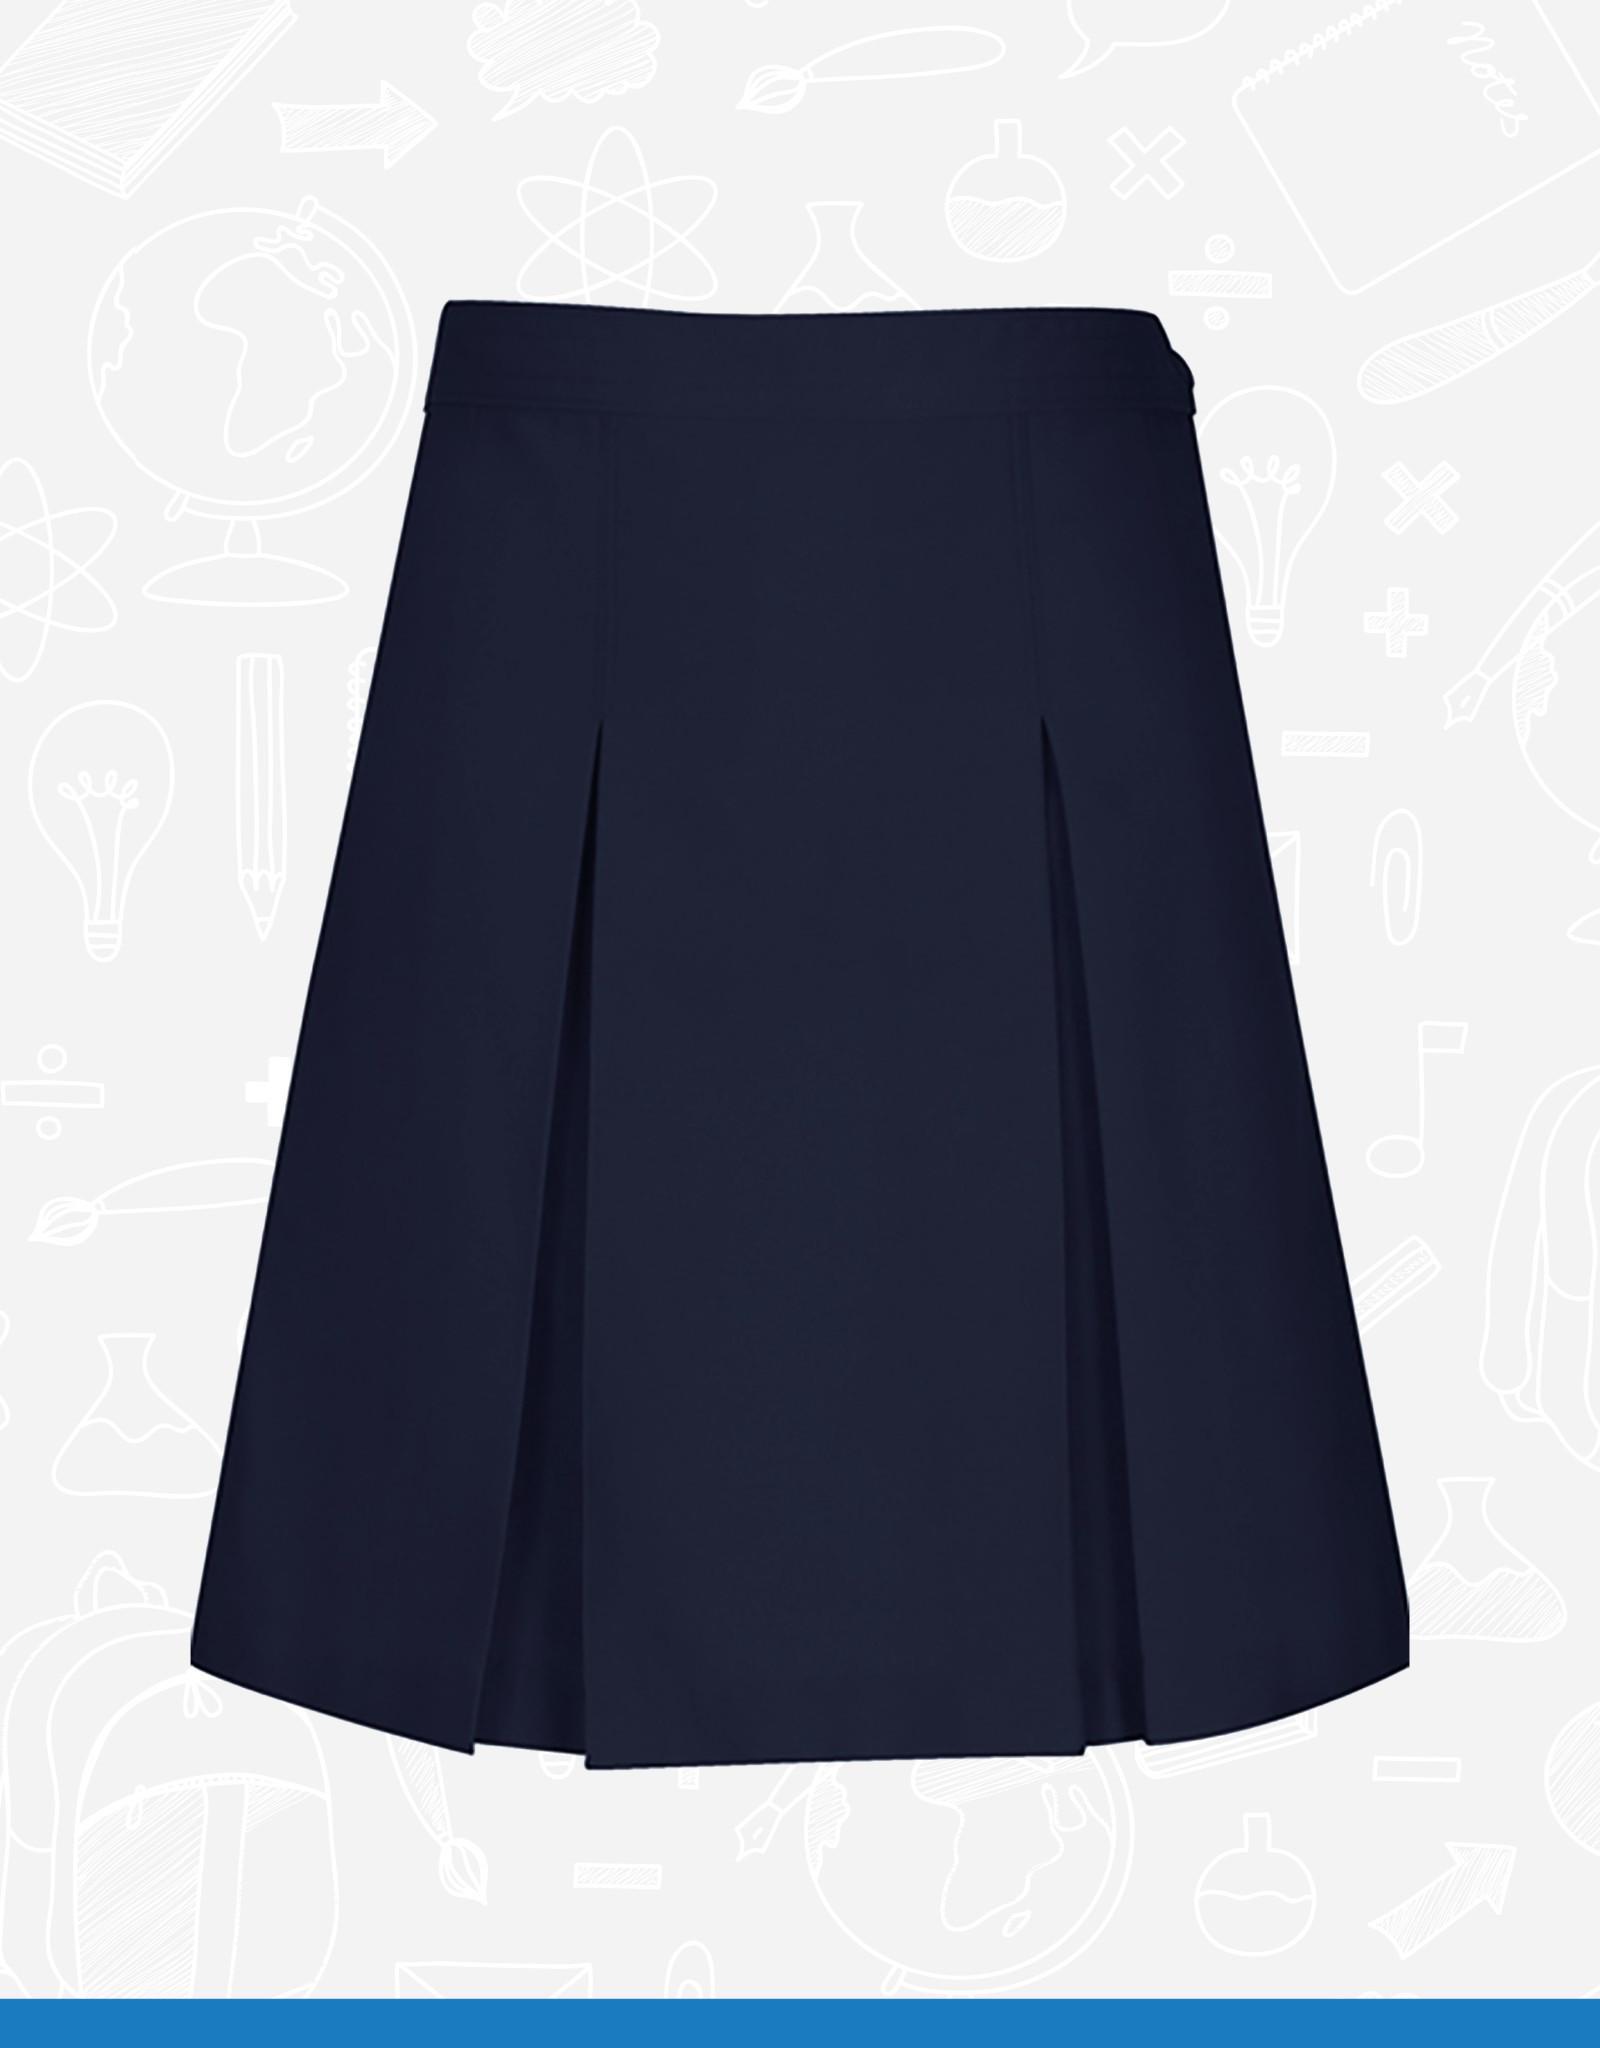 KK 4 Kick Pleat Skirt BAN (SS119)